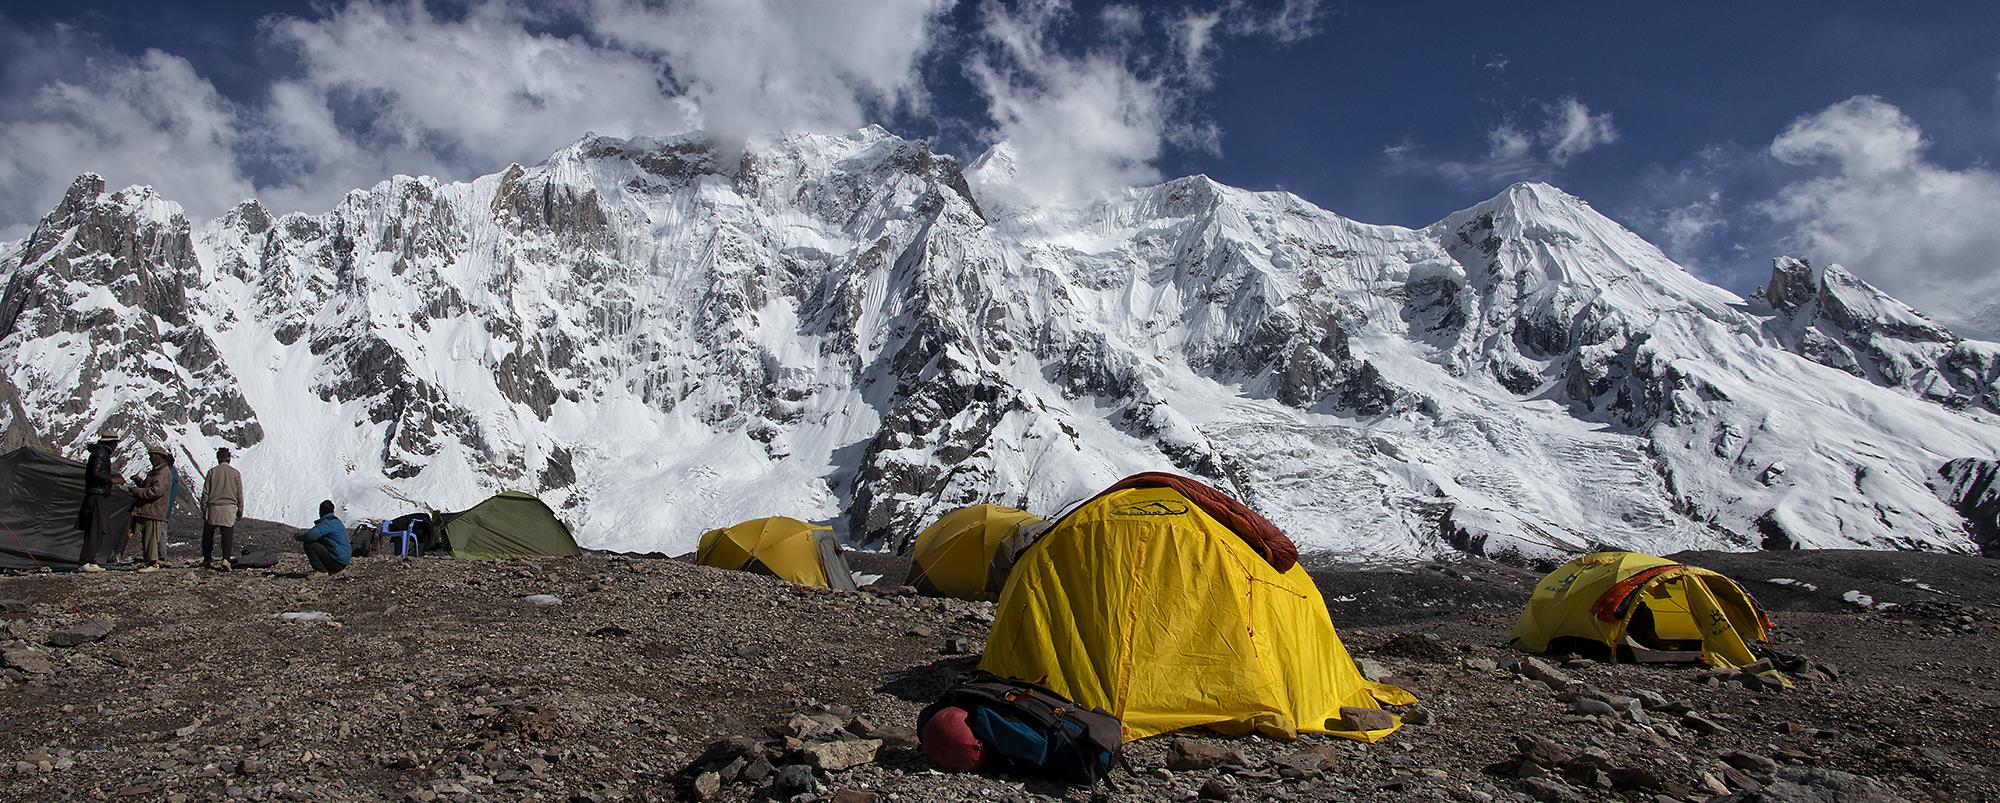 k2 trekking news